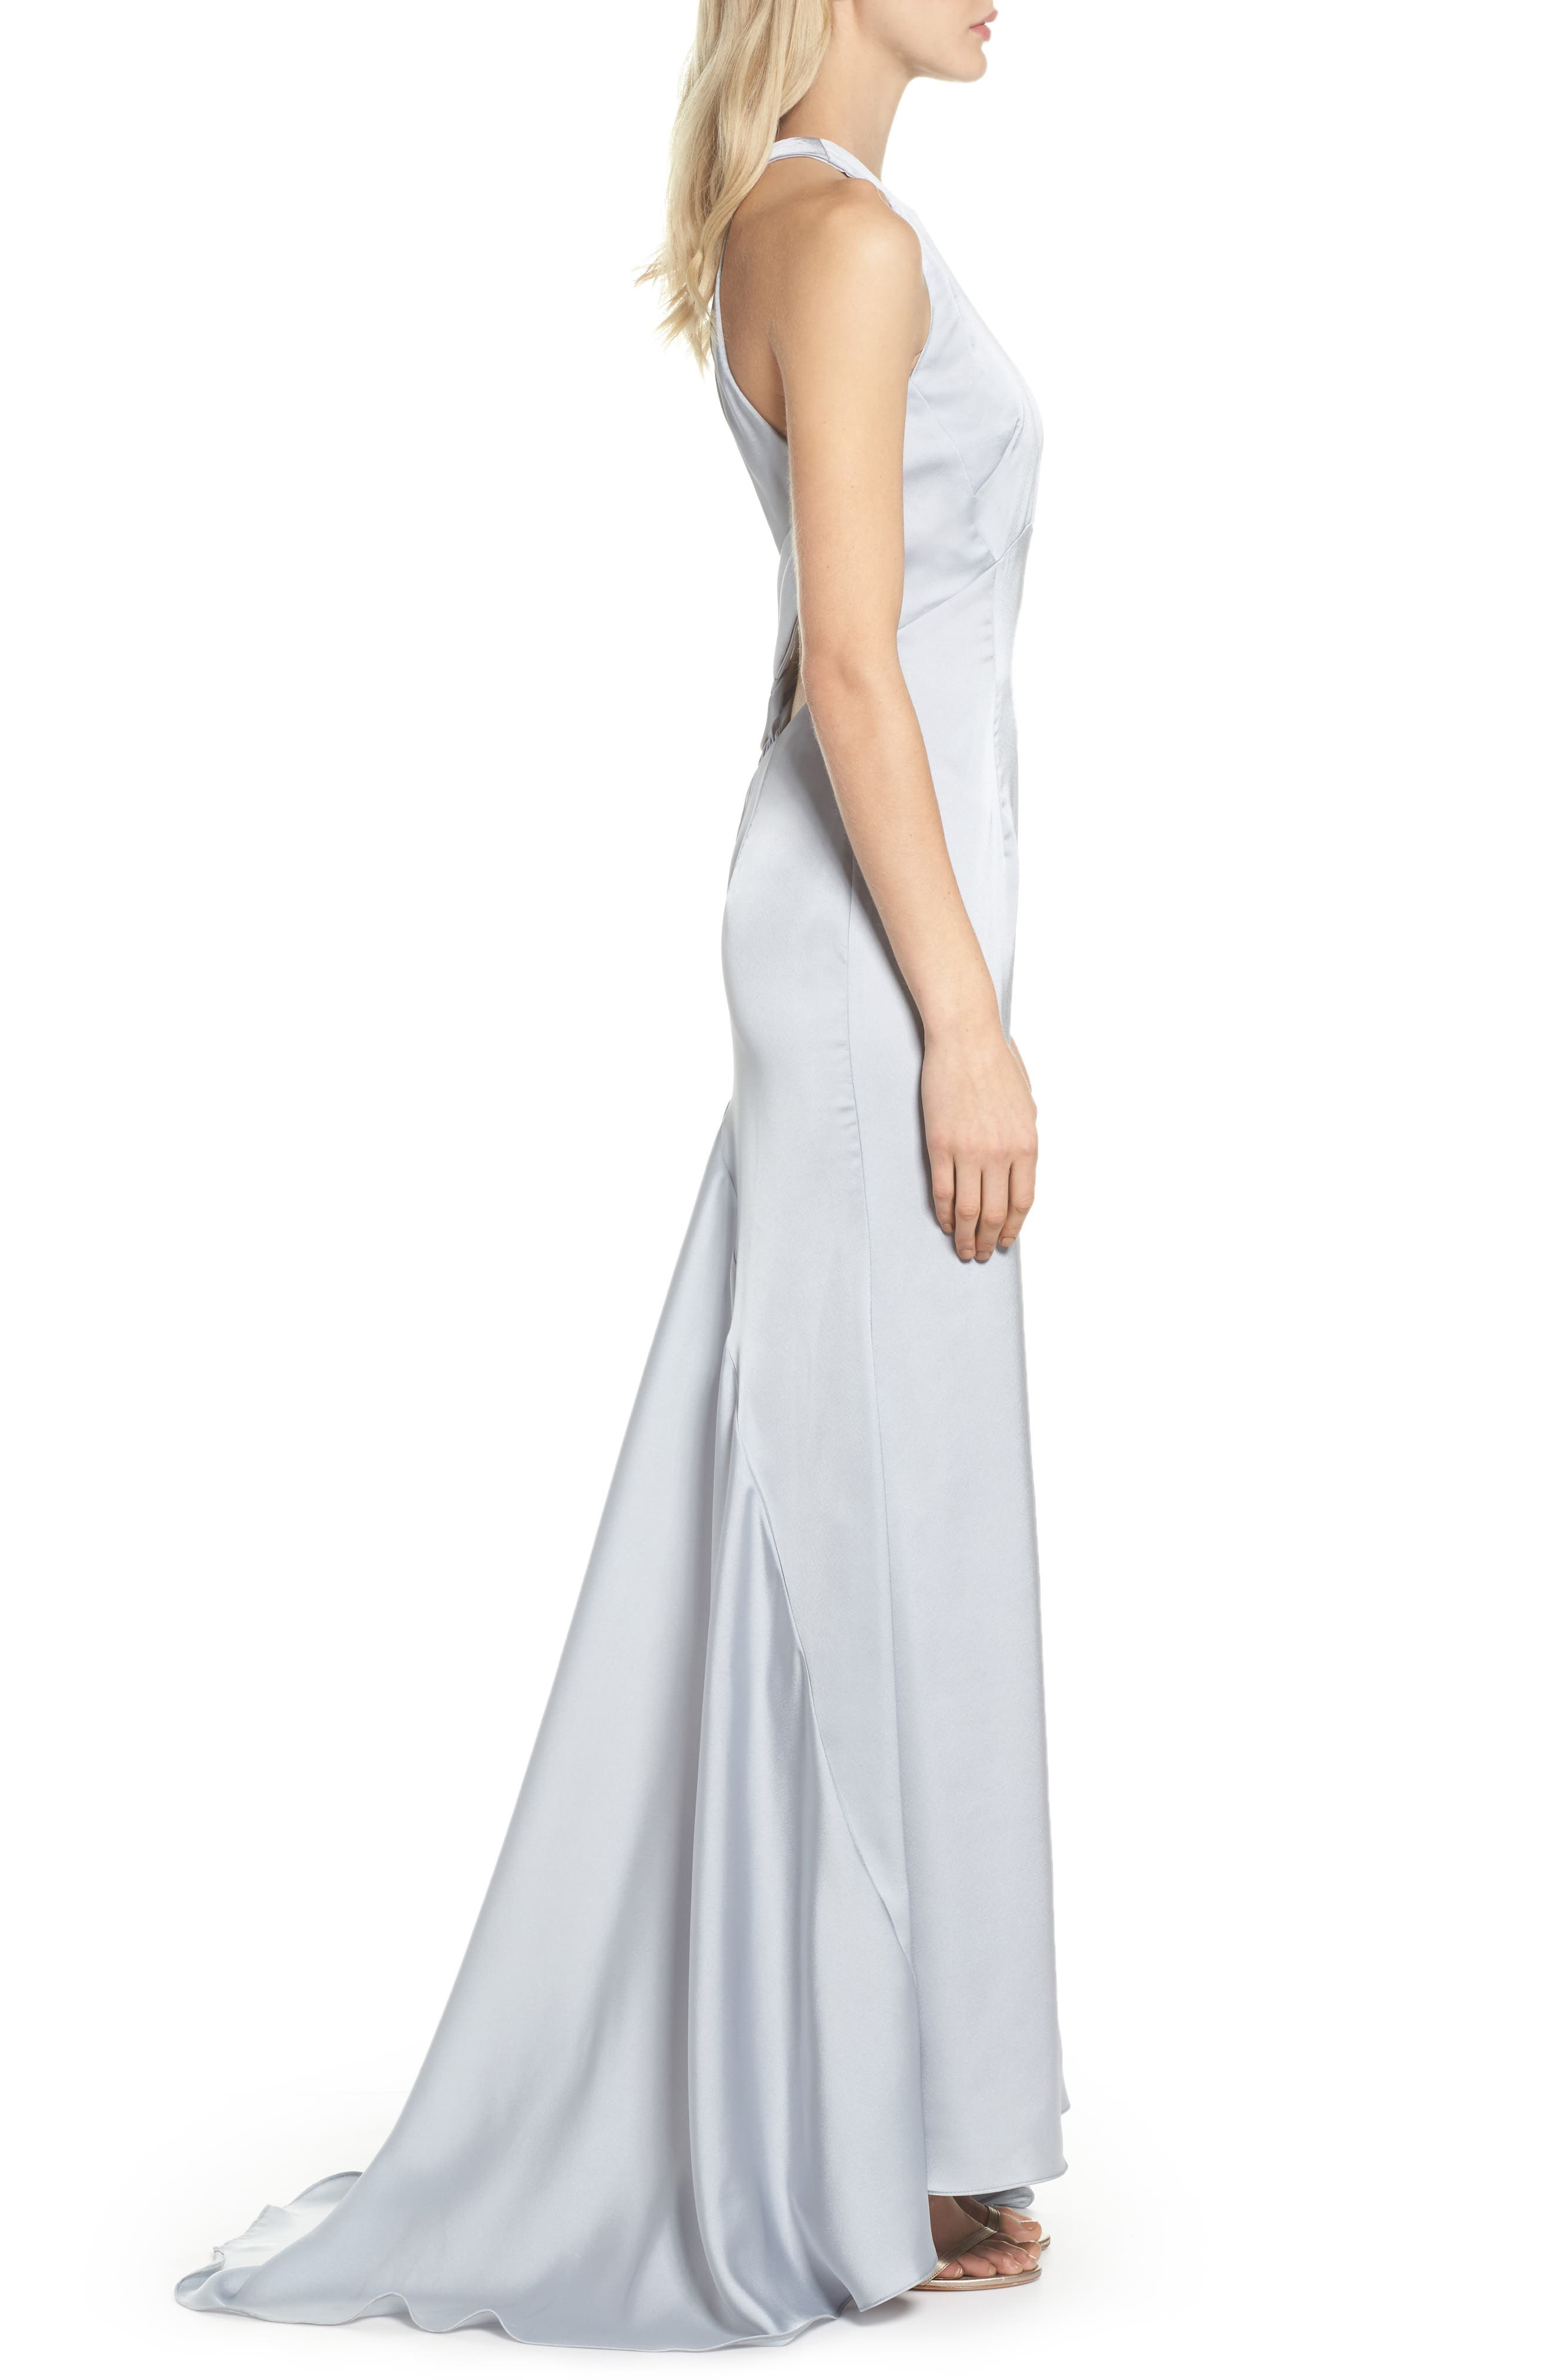 Amara Cross Back Satin Gown,                             Alternate thumbnail 3, color,                             044